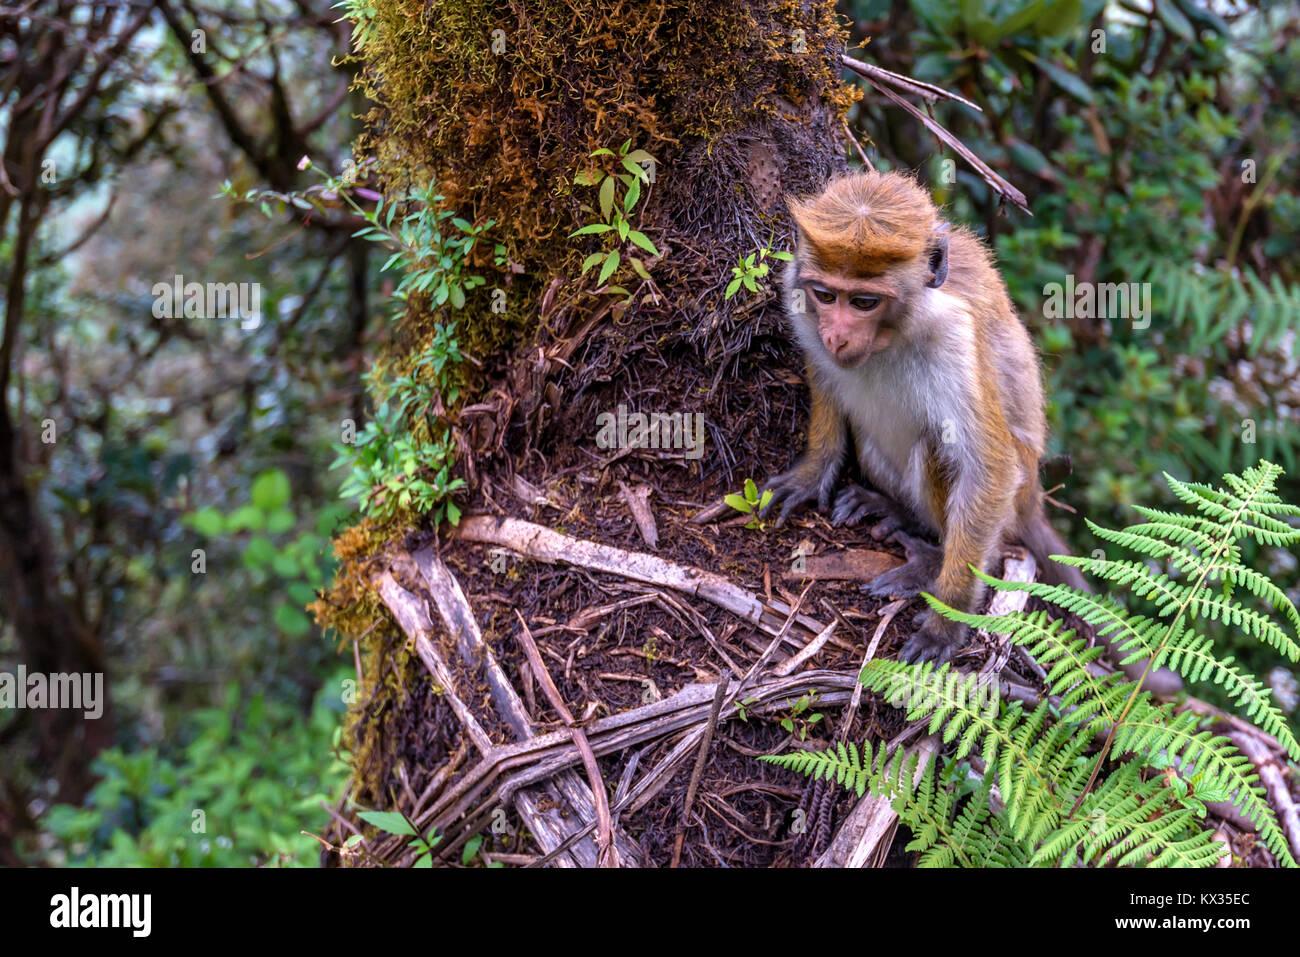 Srilankan toque macaque or Macaca sinica in jungle Stock Photo